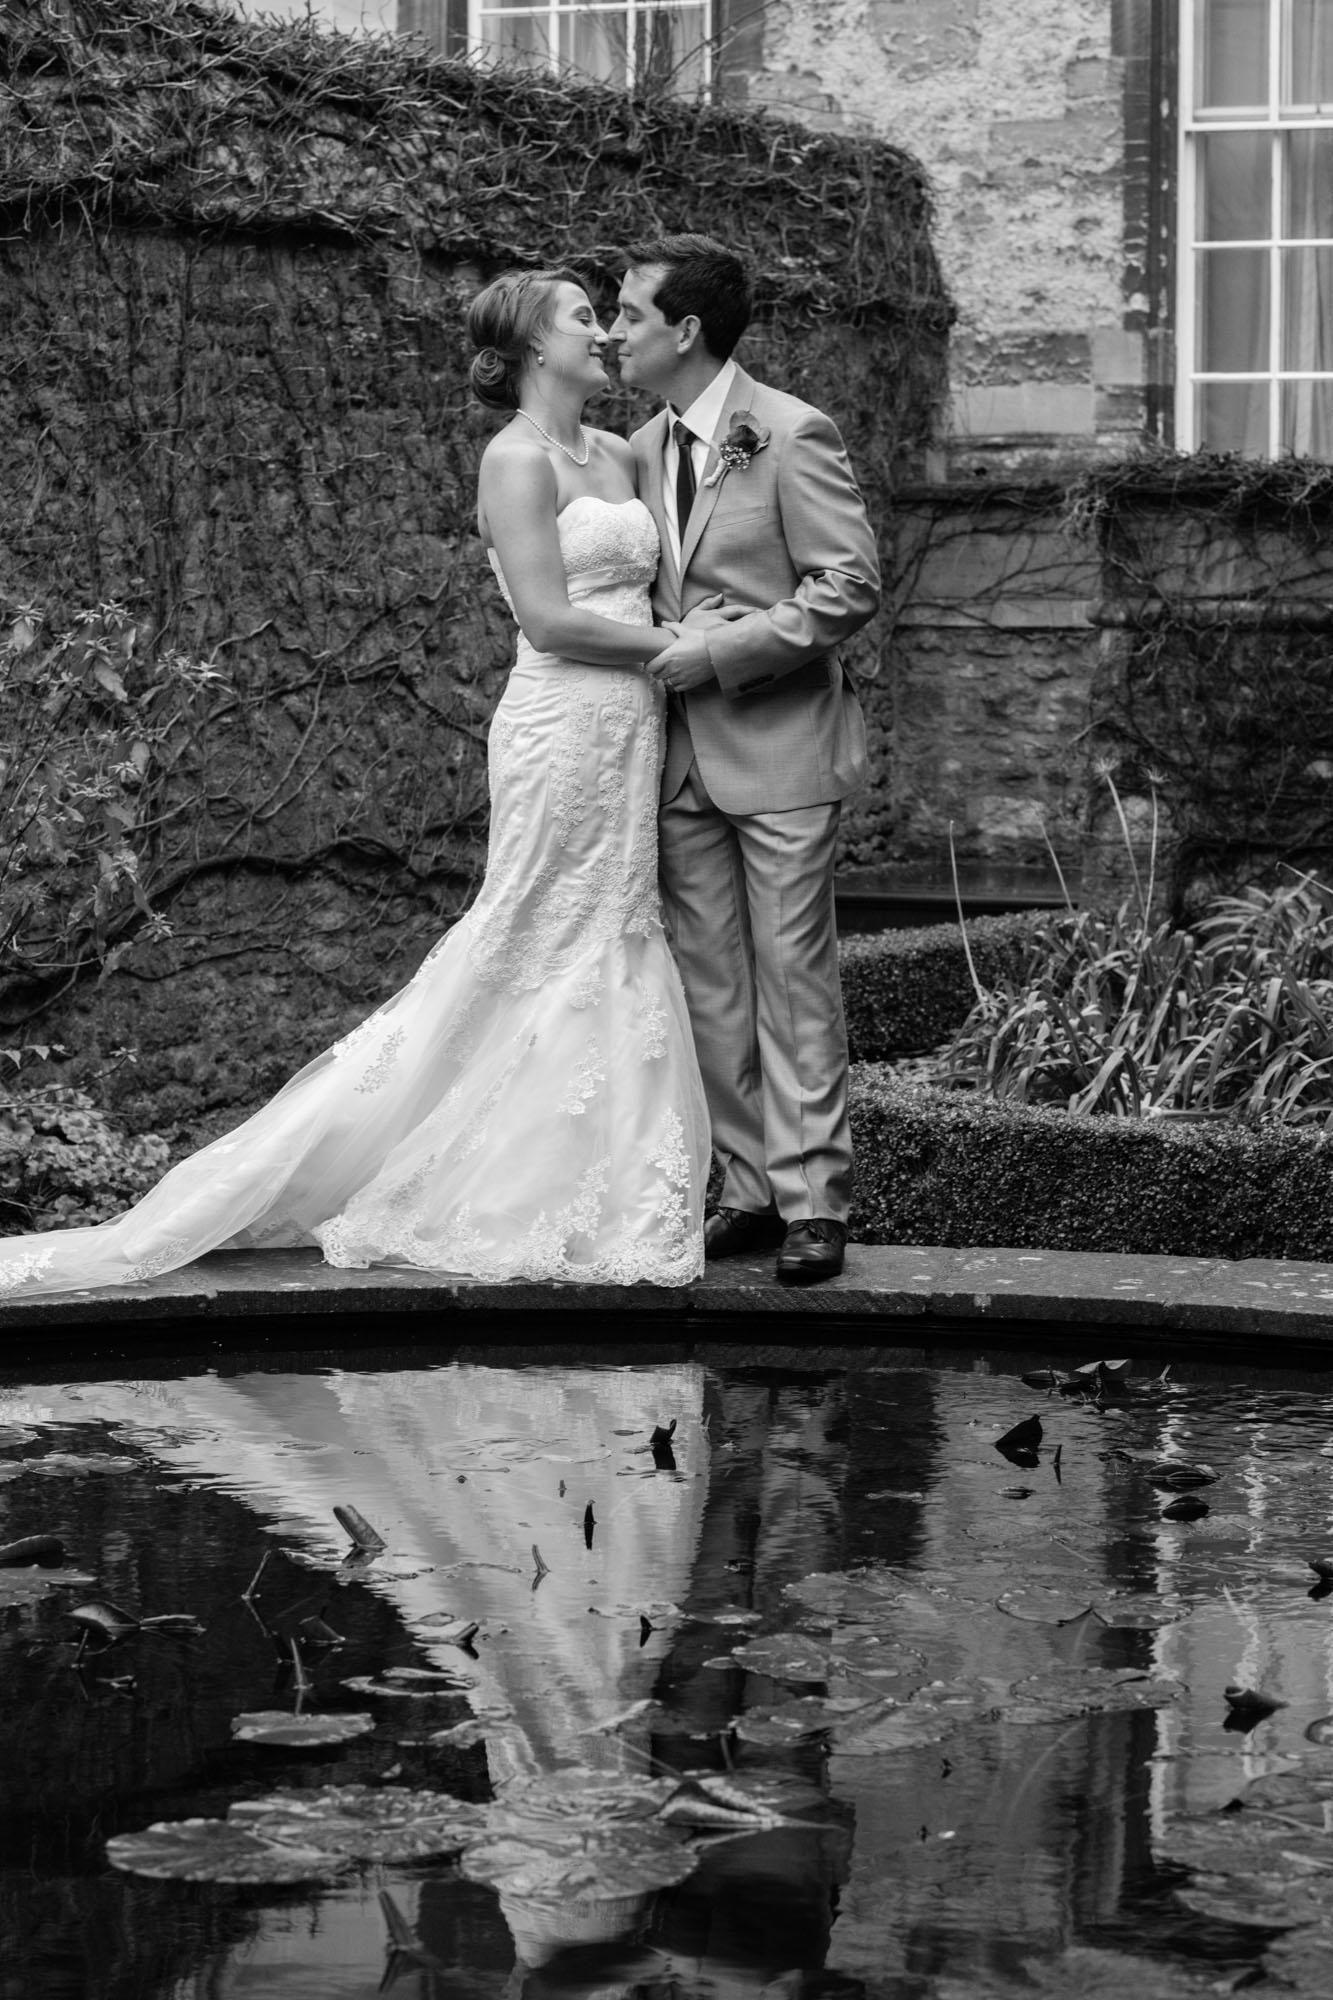 weddings-couples-love-photographer-oxford-london-jonathan-self-photography-61.jpg